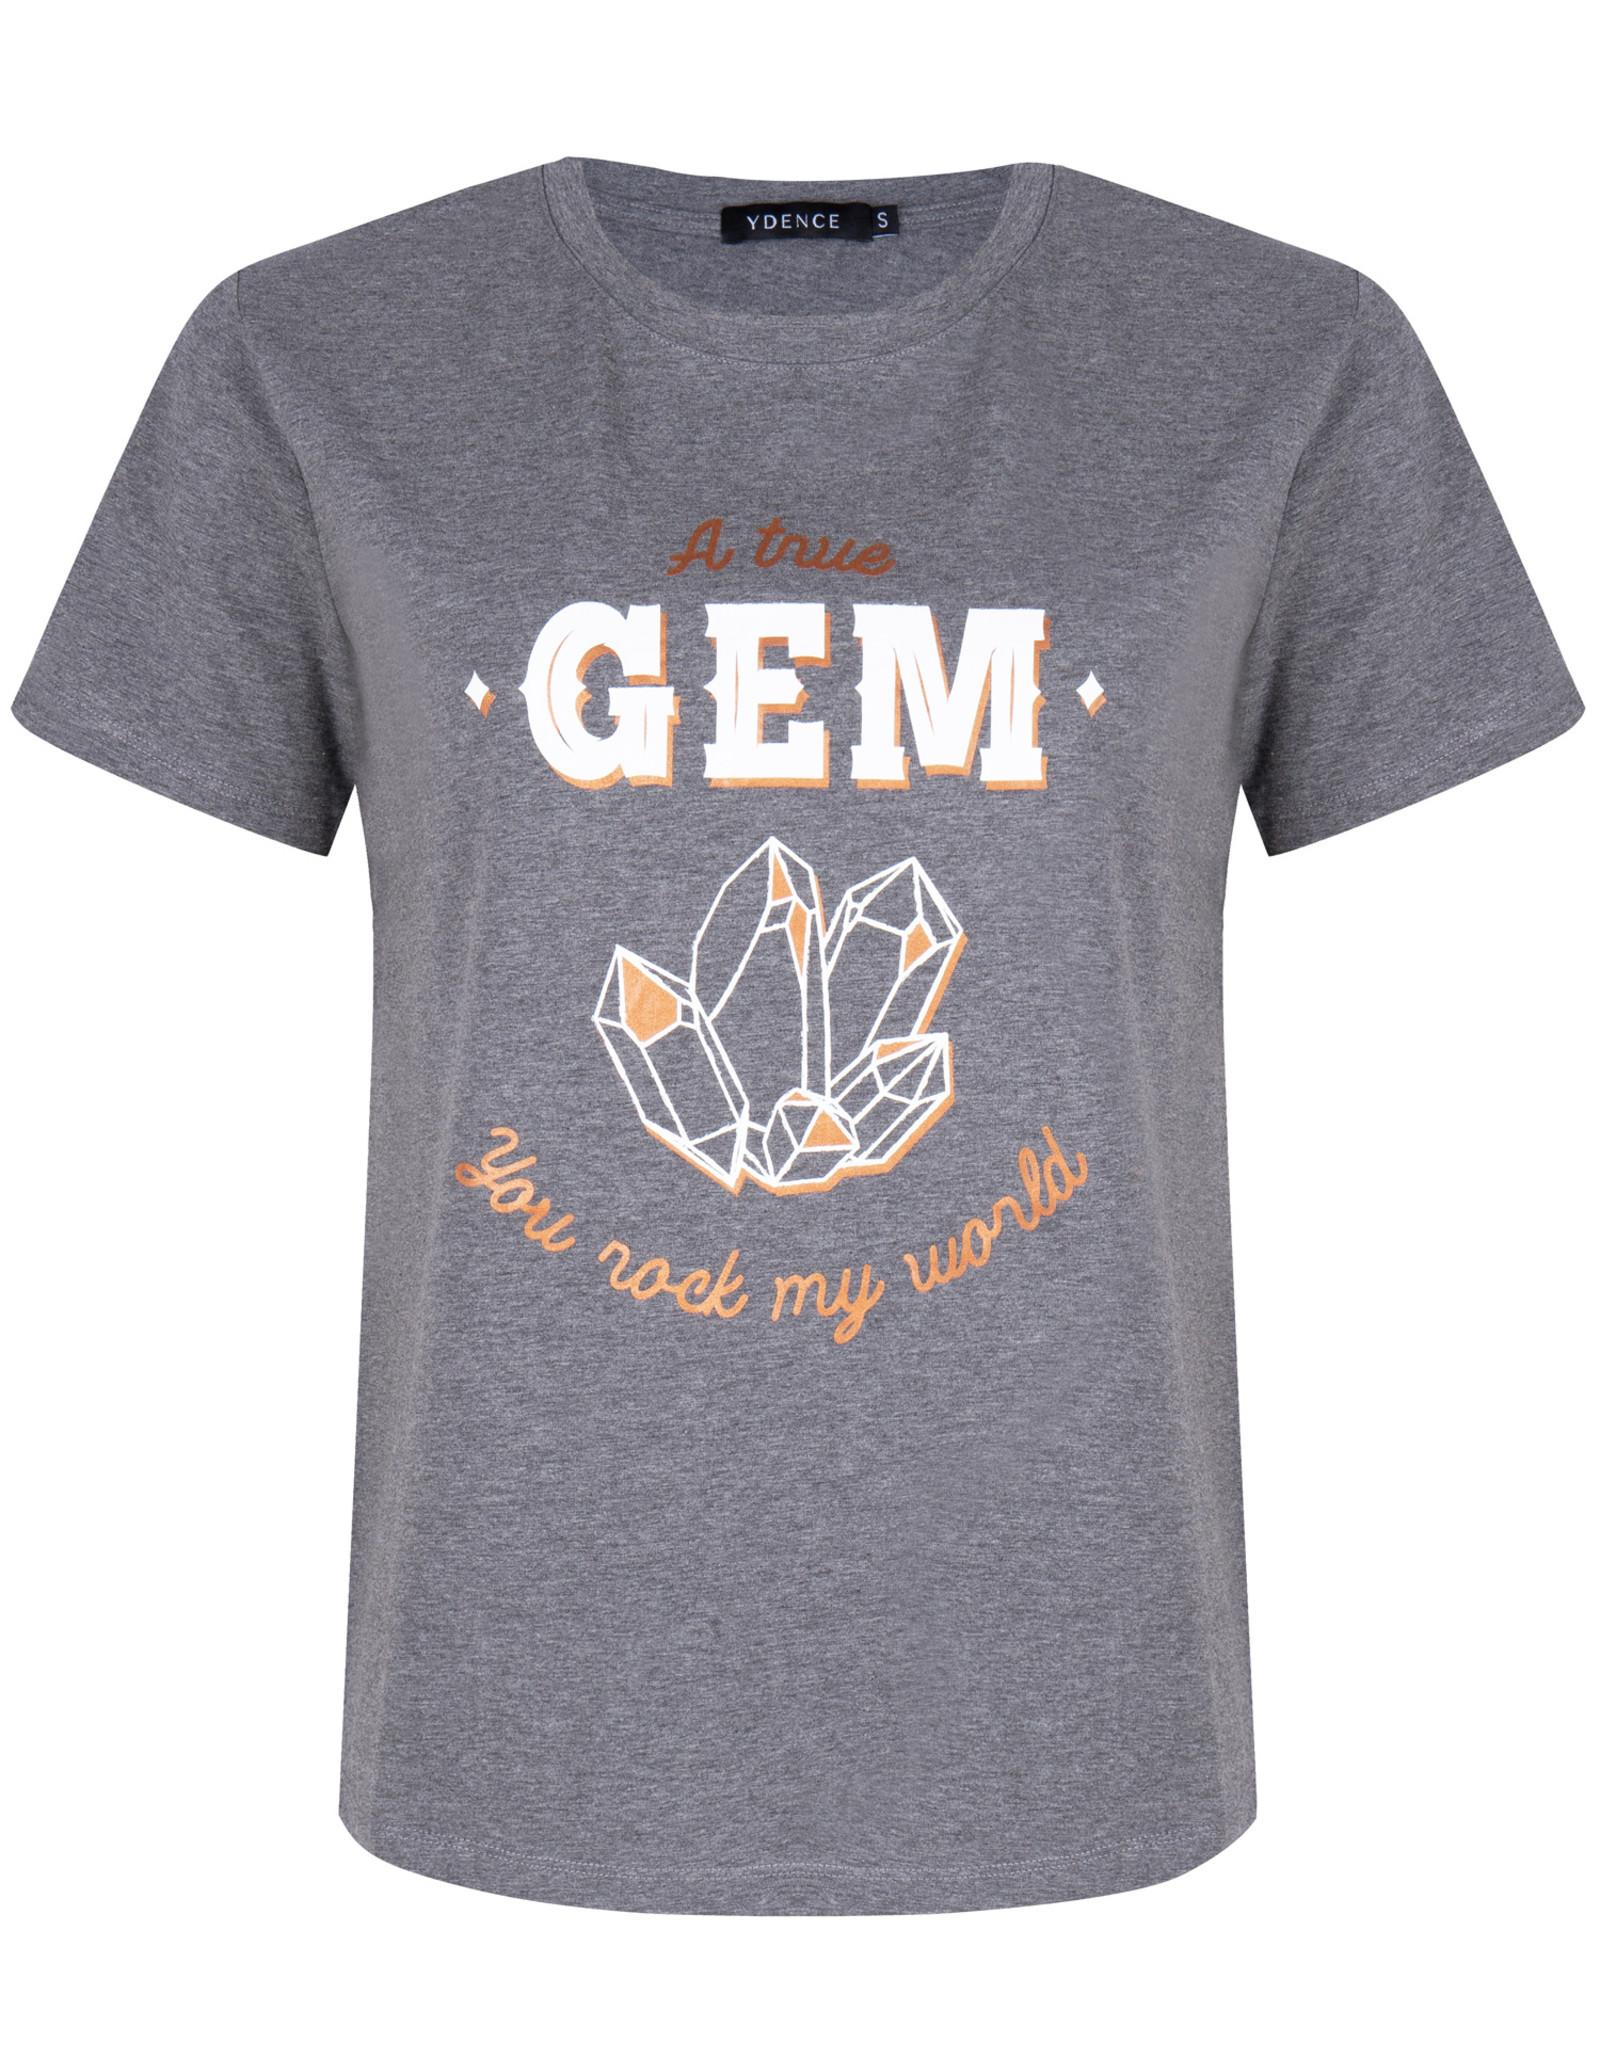 Ydence Ydence T-shirt True Gem